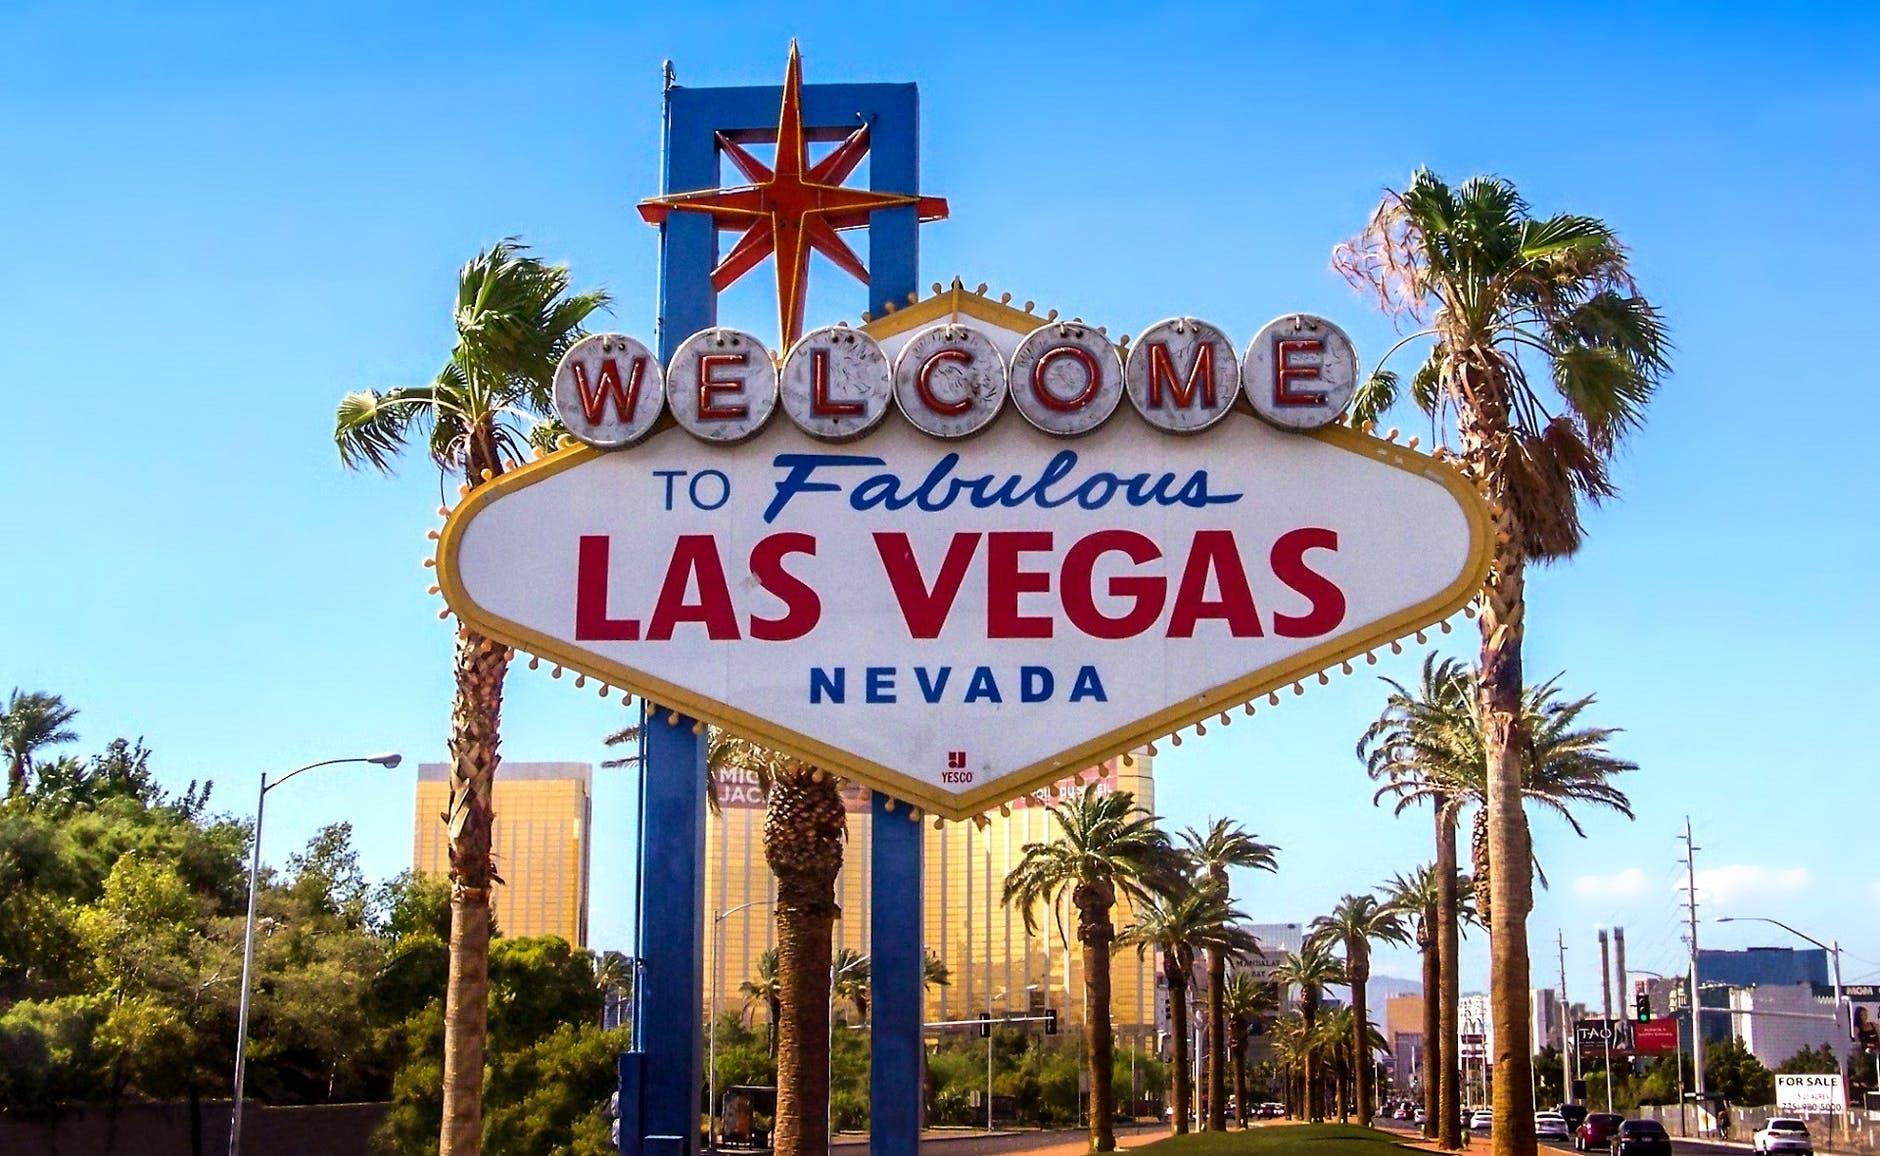 La fiera digitale CES si svolge a Las Vegas